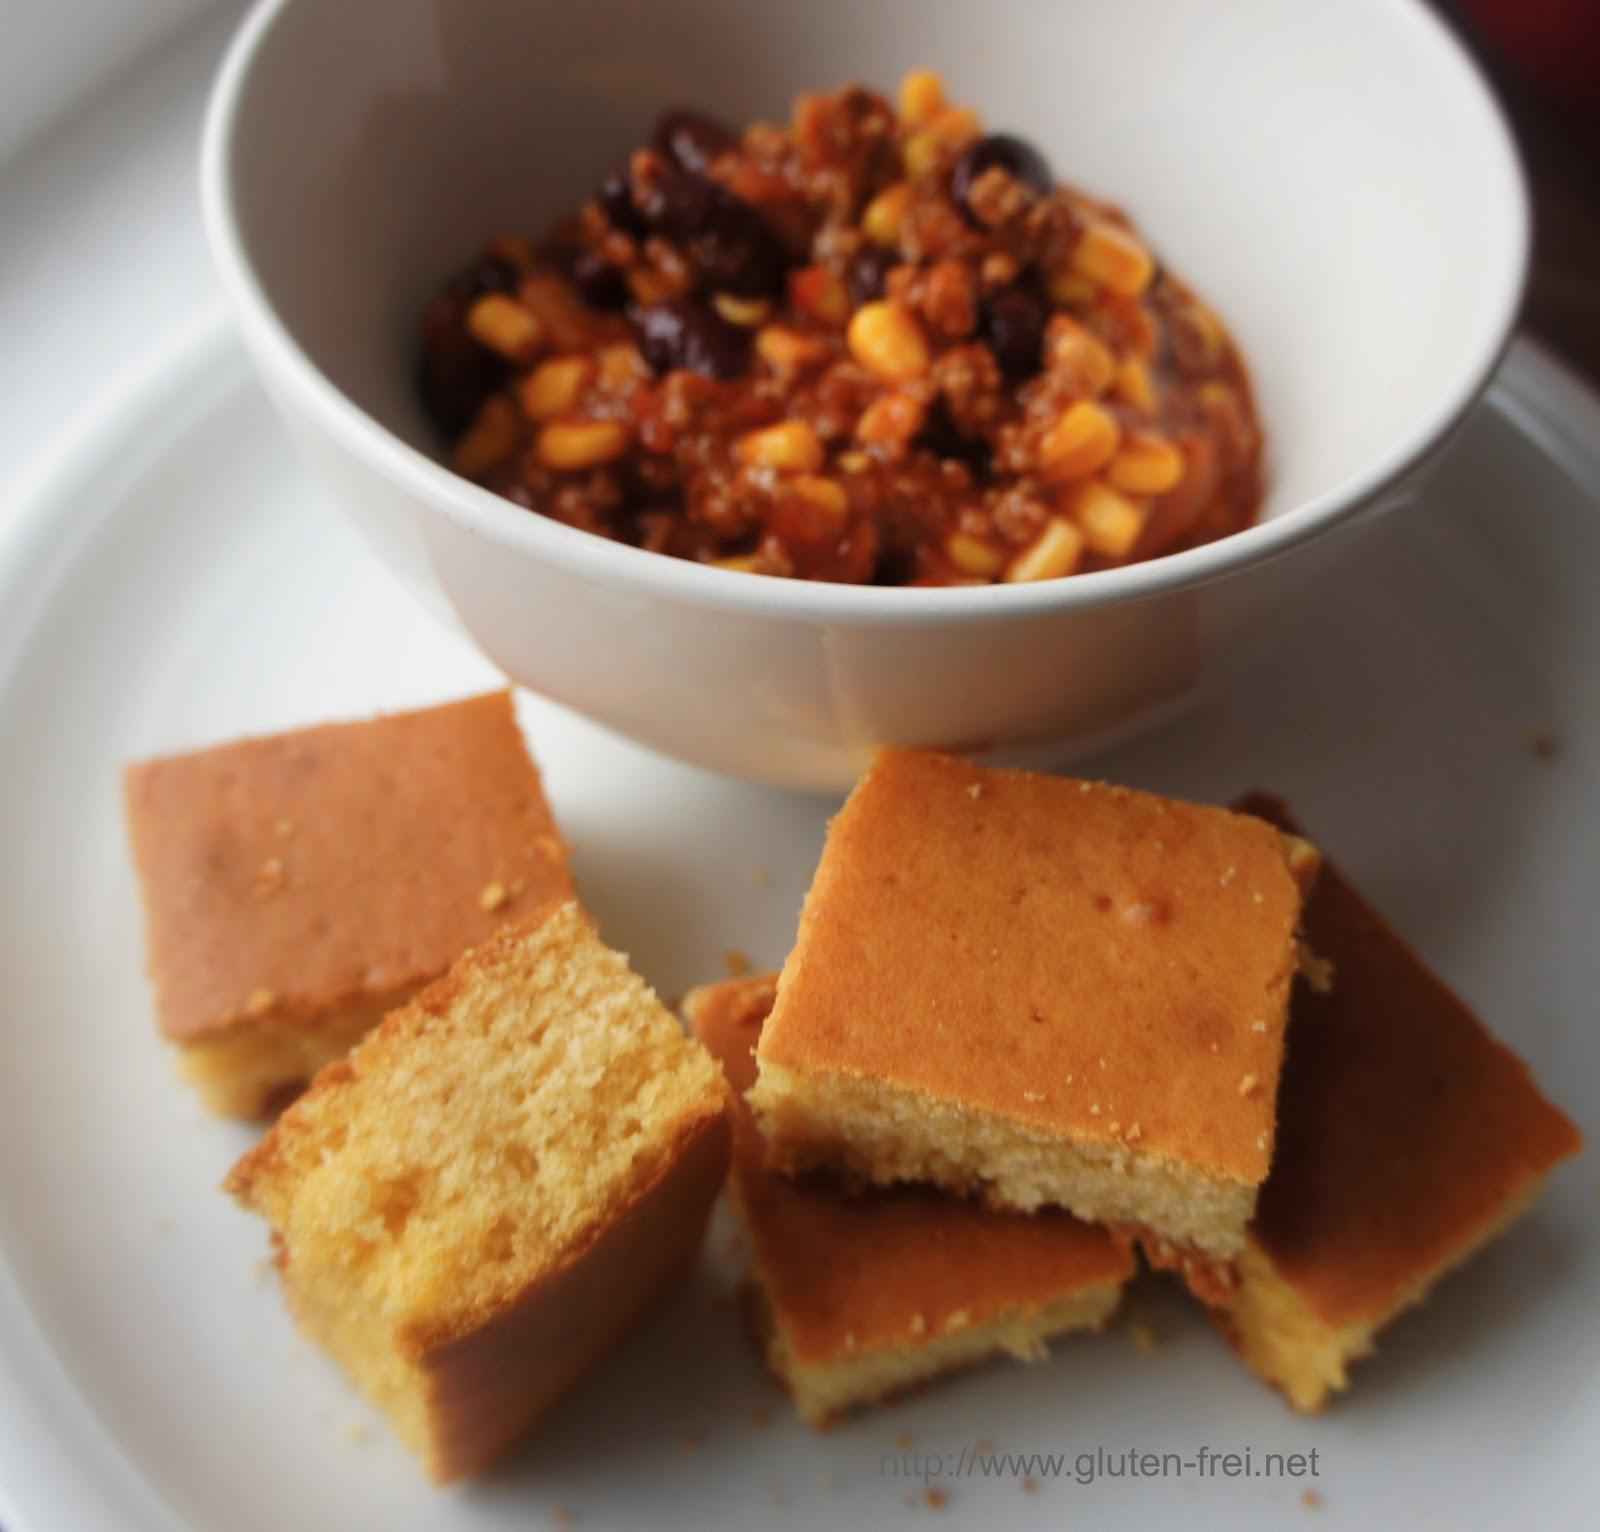 rezept chili con carne mit s em maisbrot ein glutenfreier blog. Black Bedroom Furniture Sets. Home Design Ideas